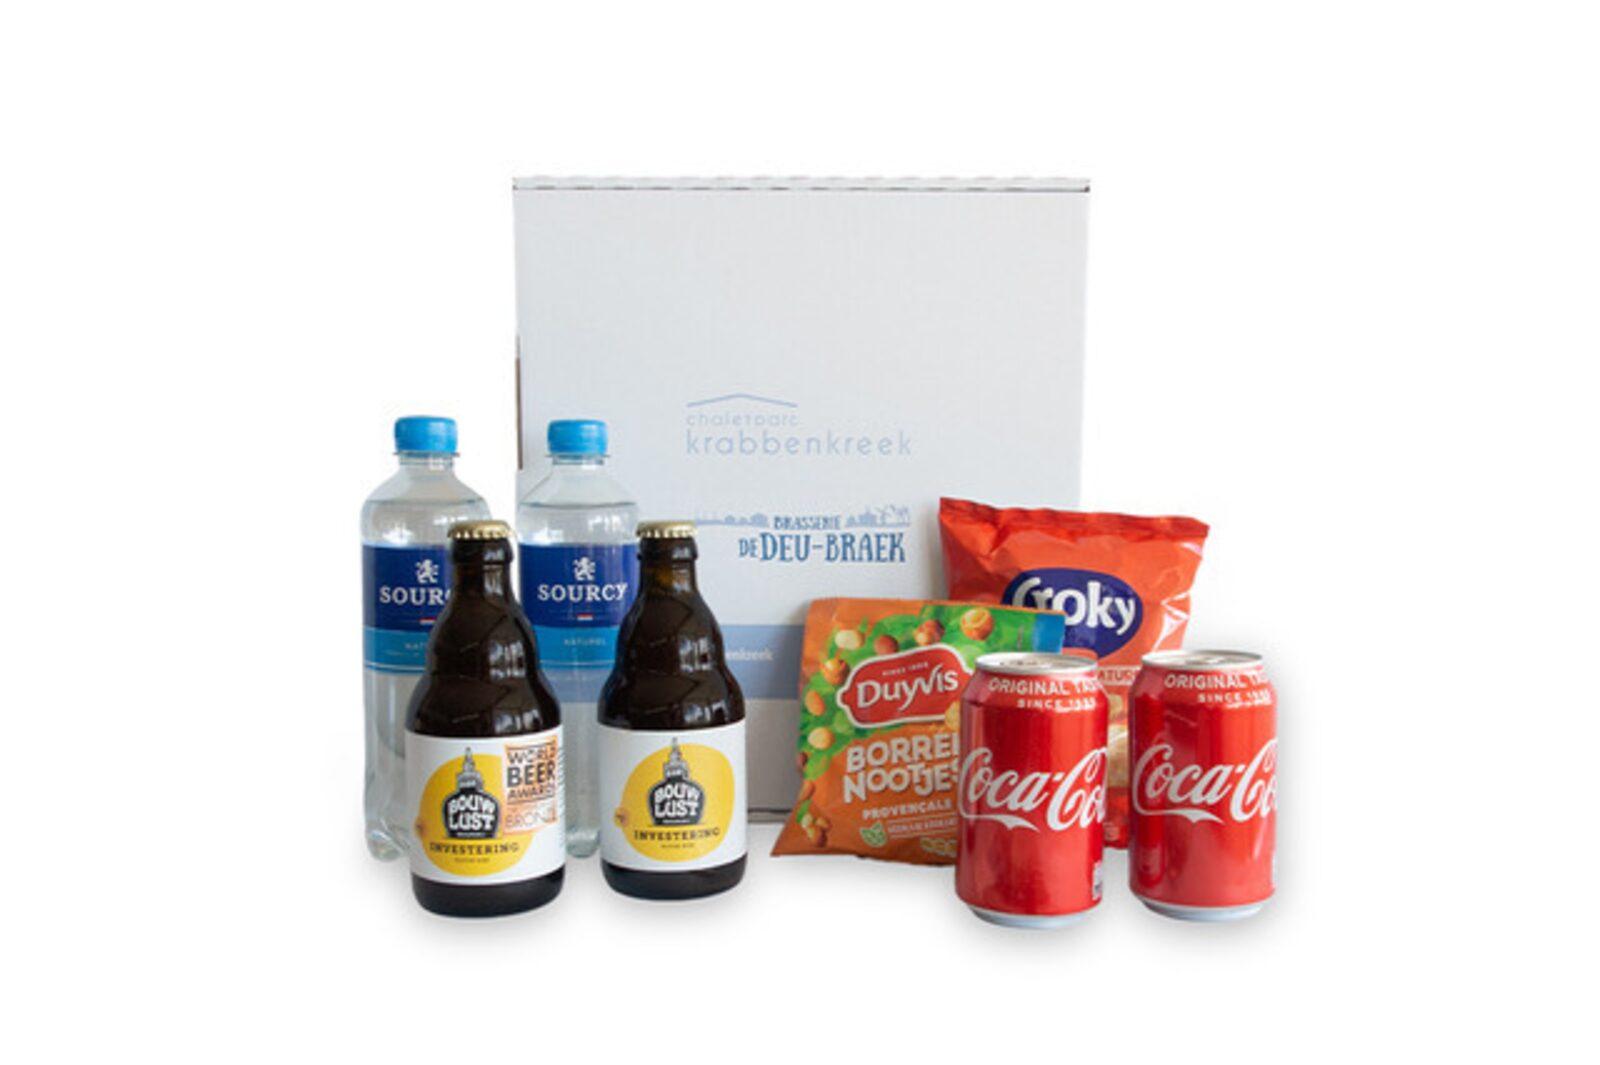 Minibar-Paket mit Bier